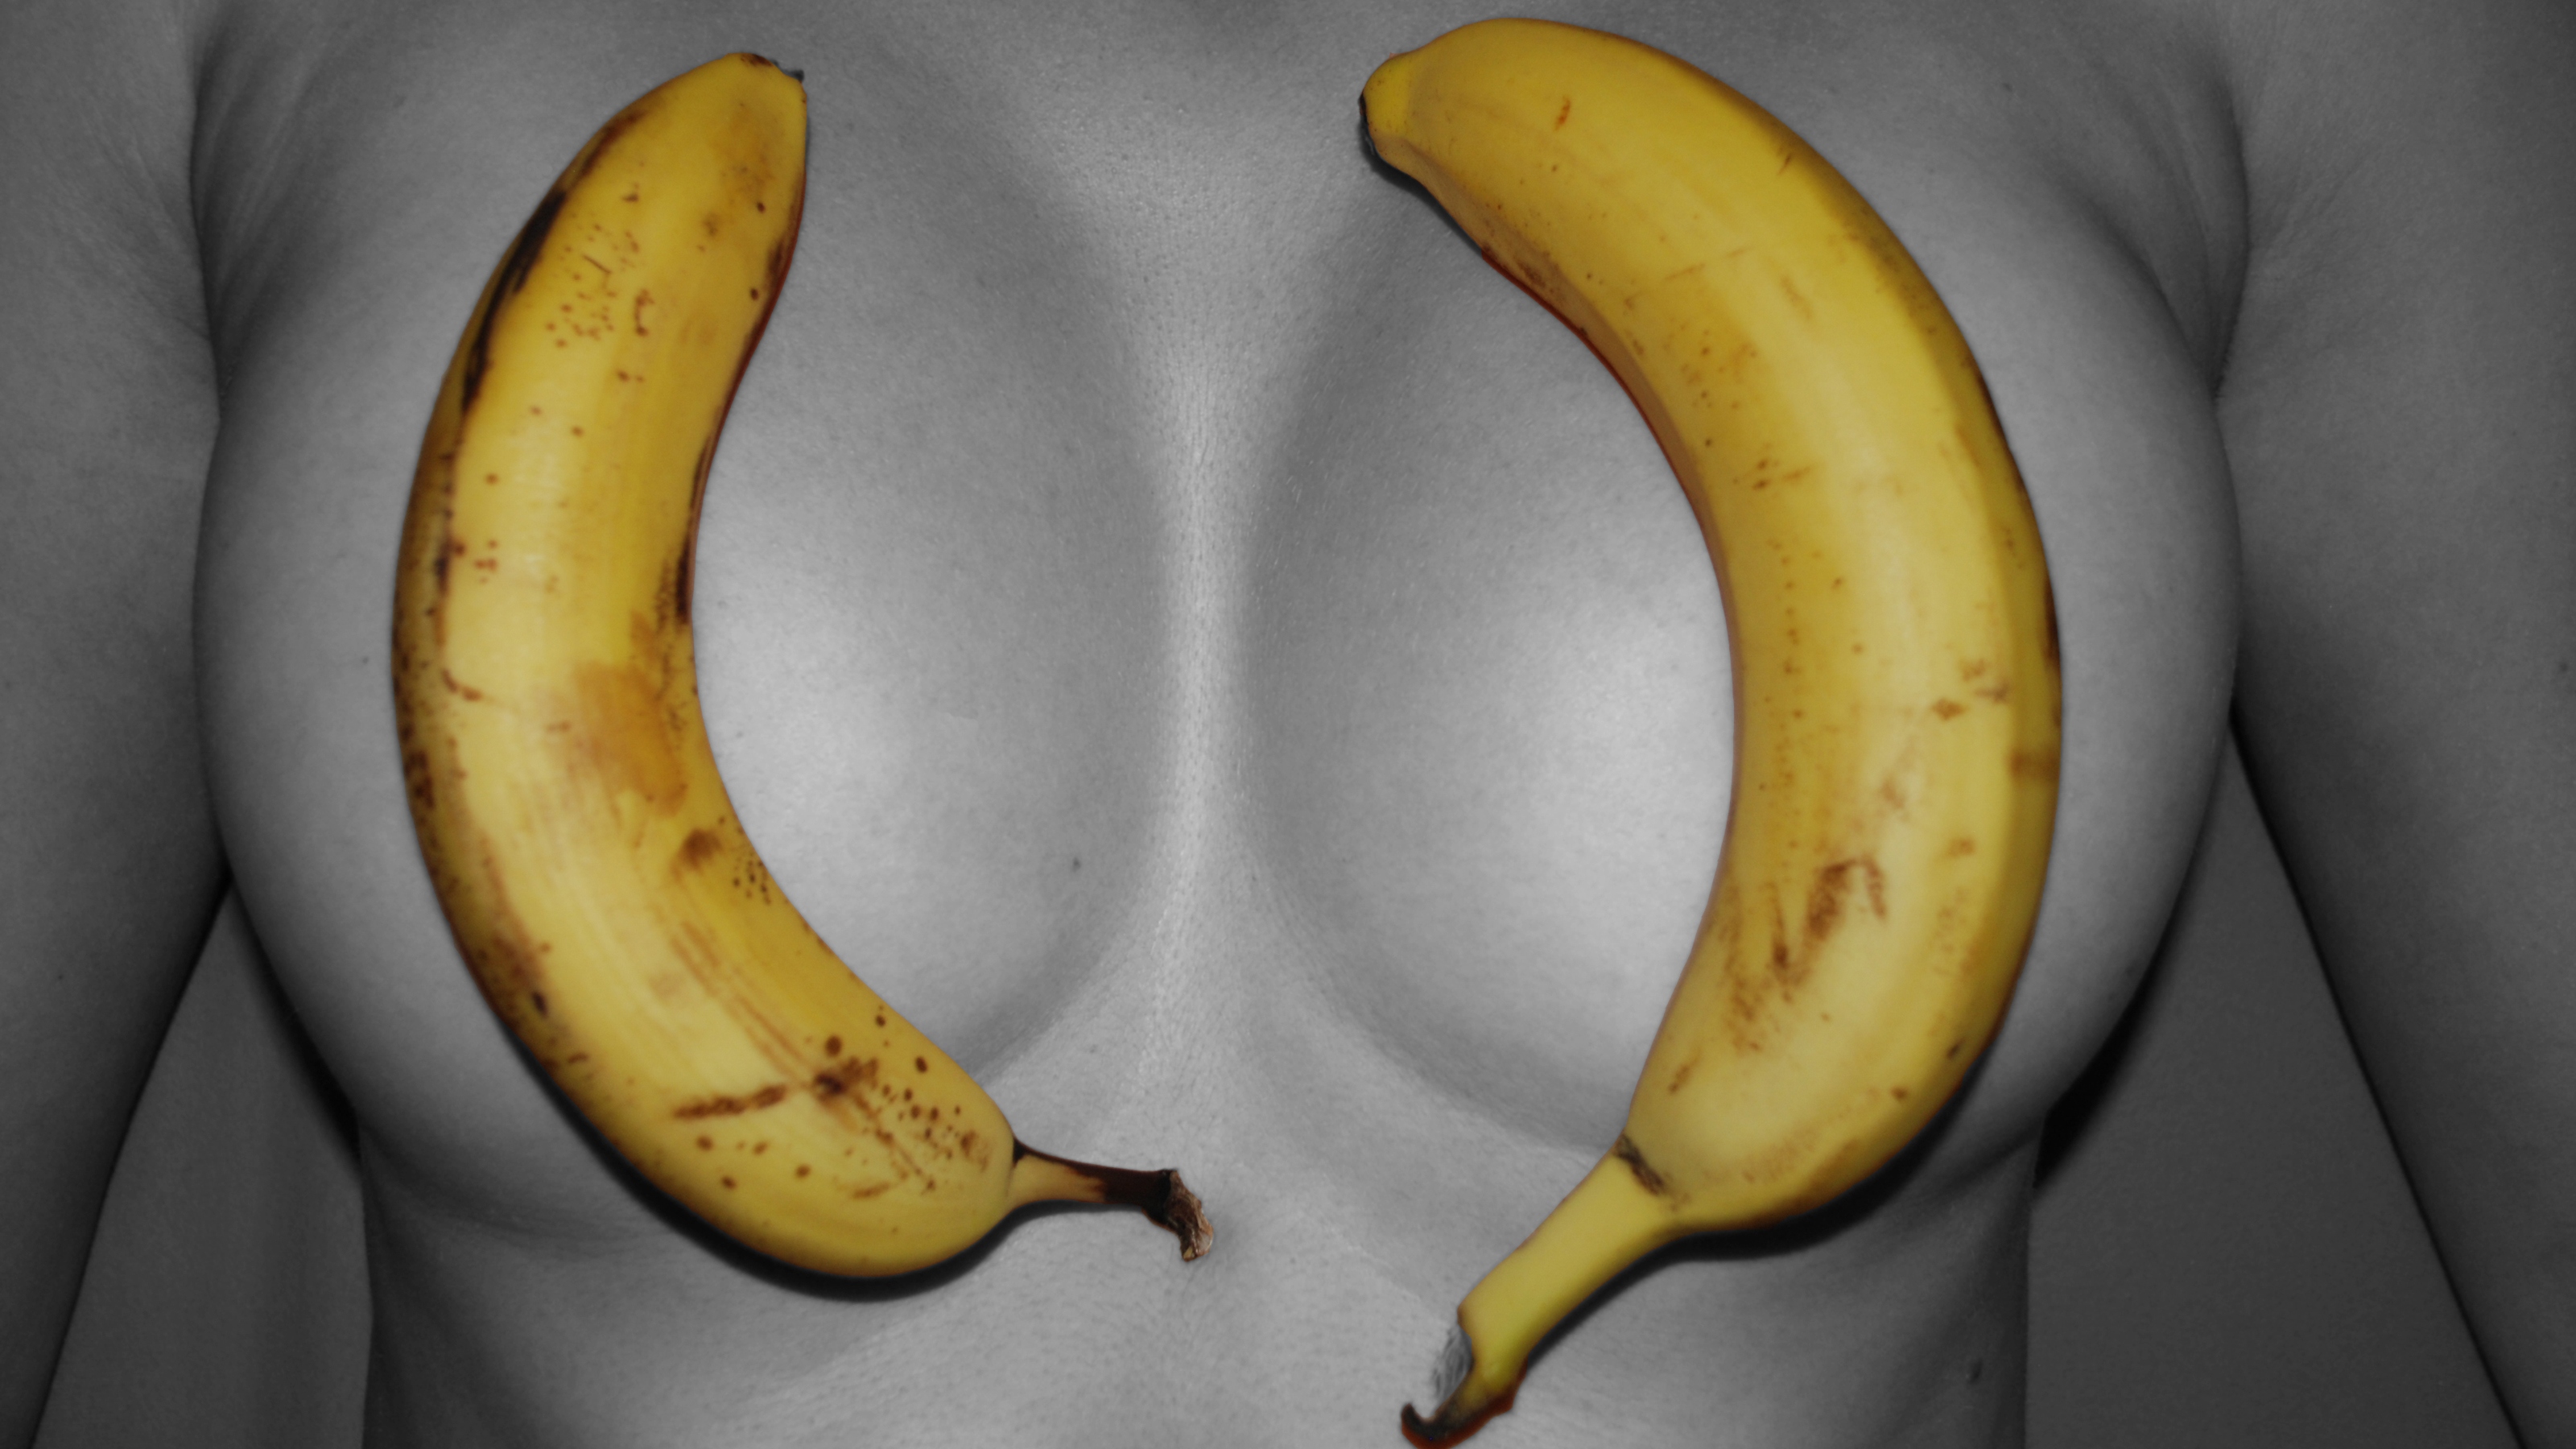 Bananas&Breast